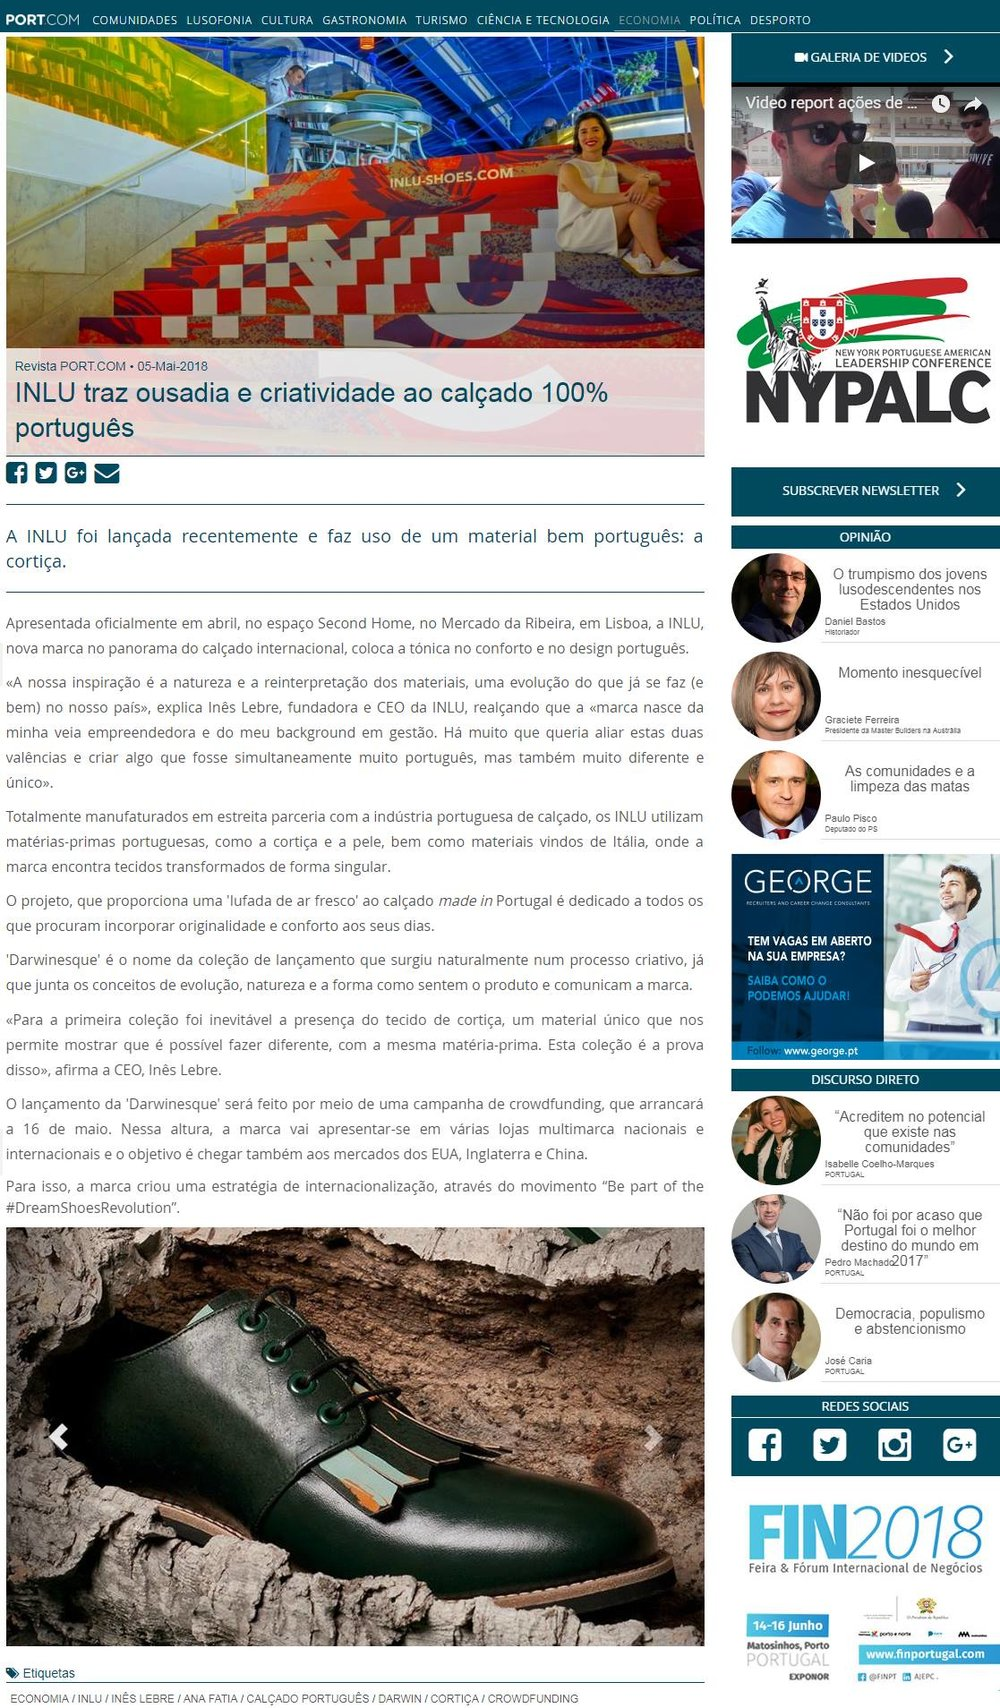 INLU_Port-com.jpg